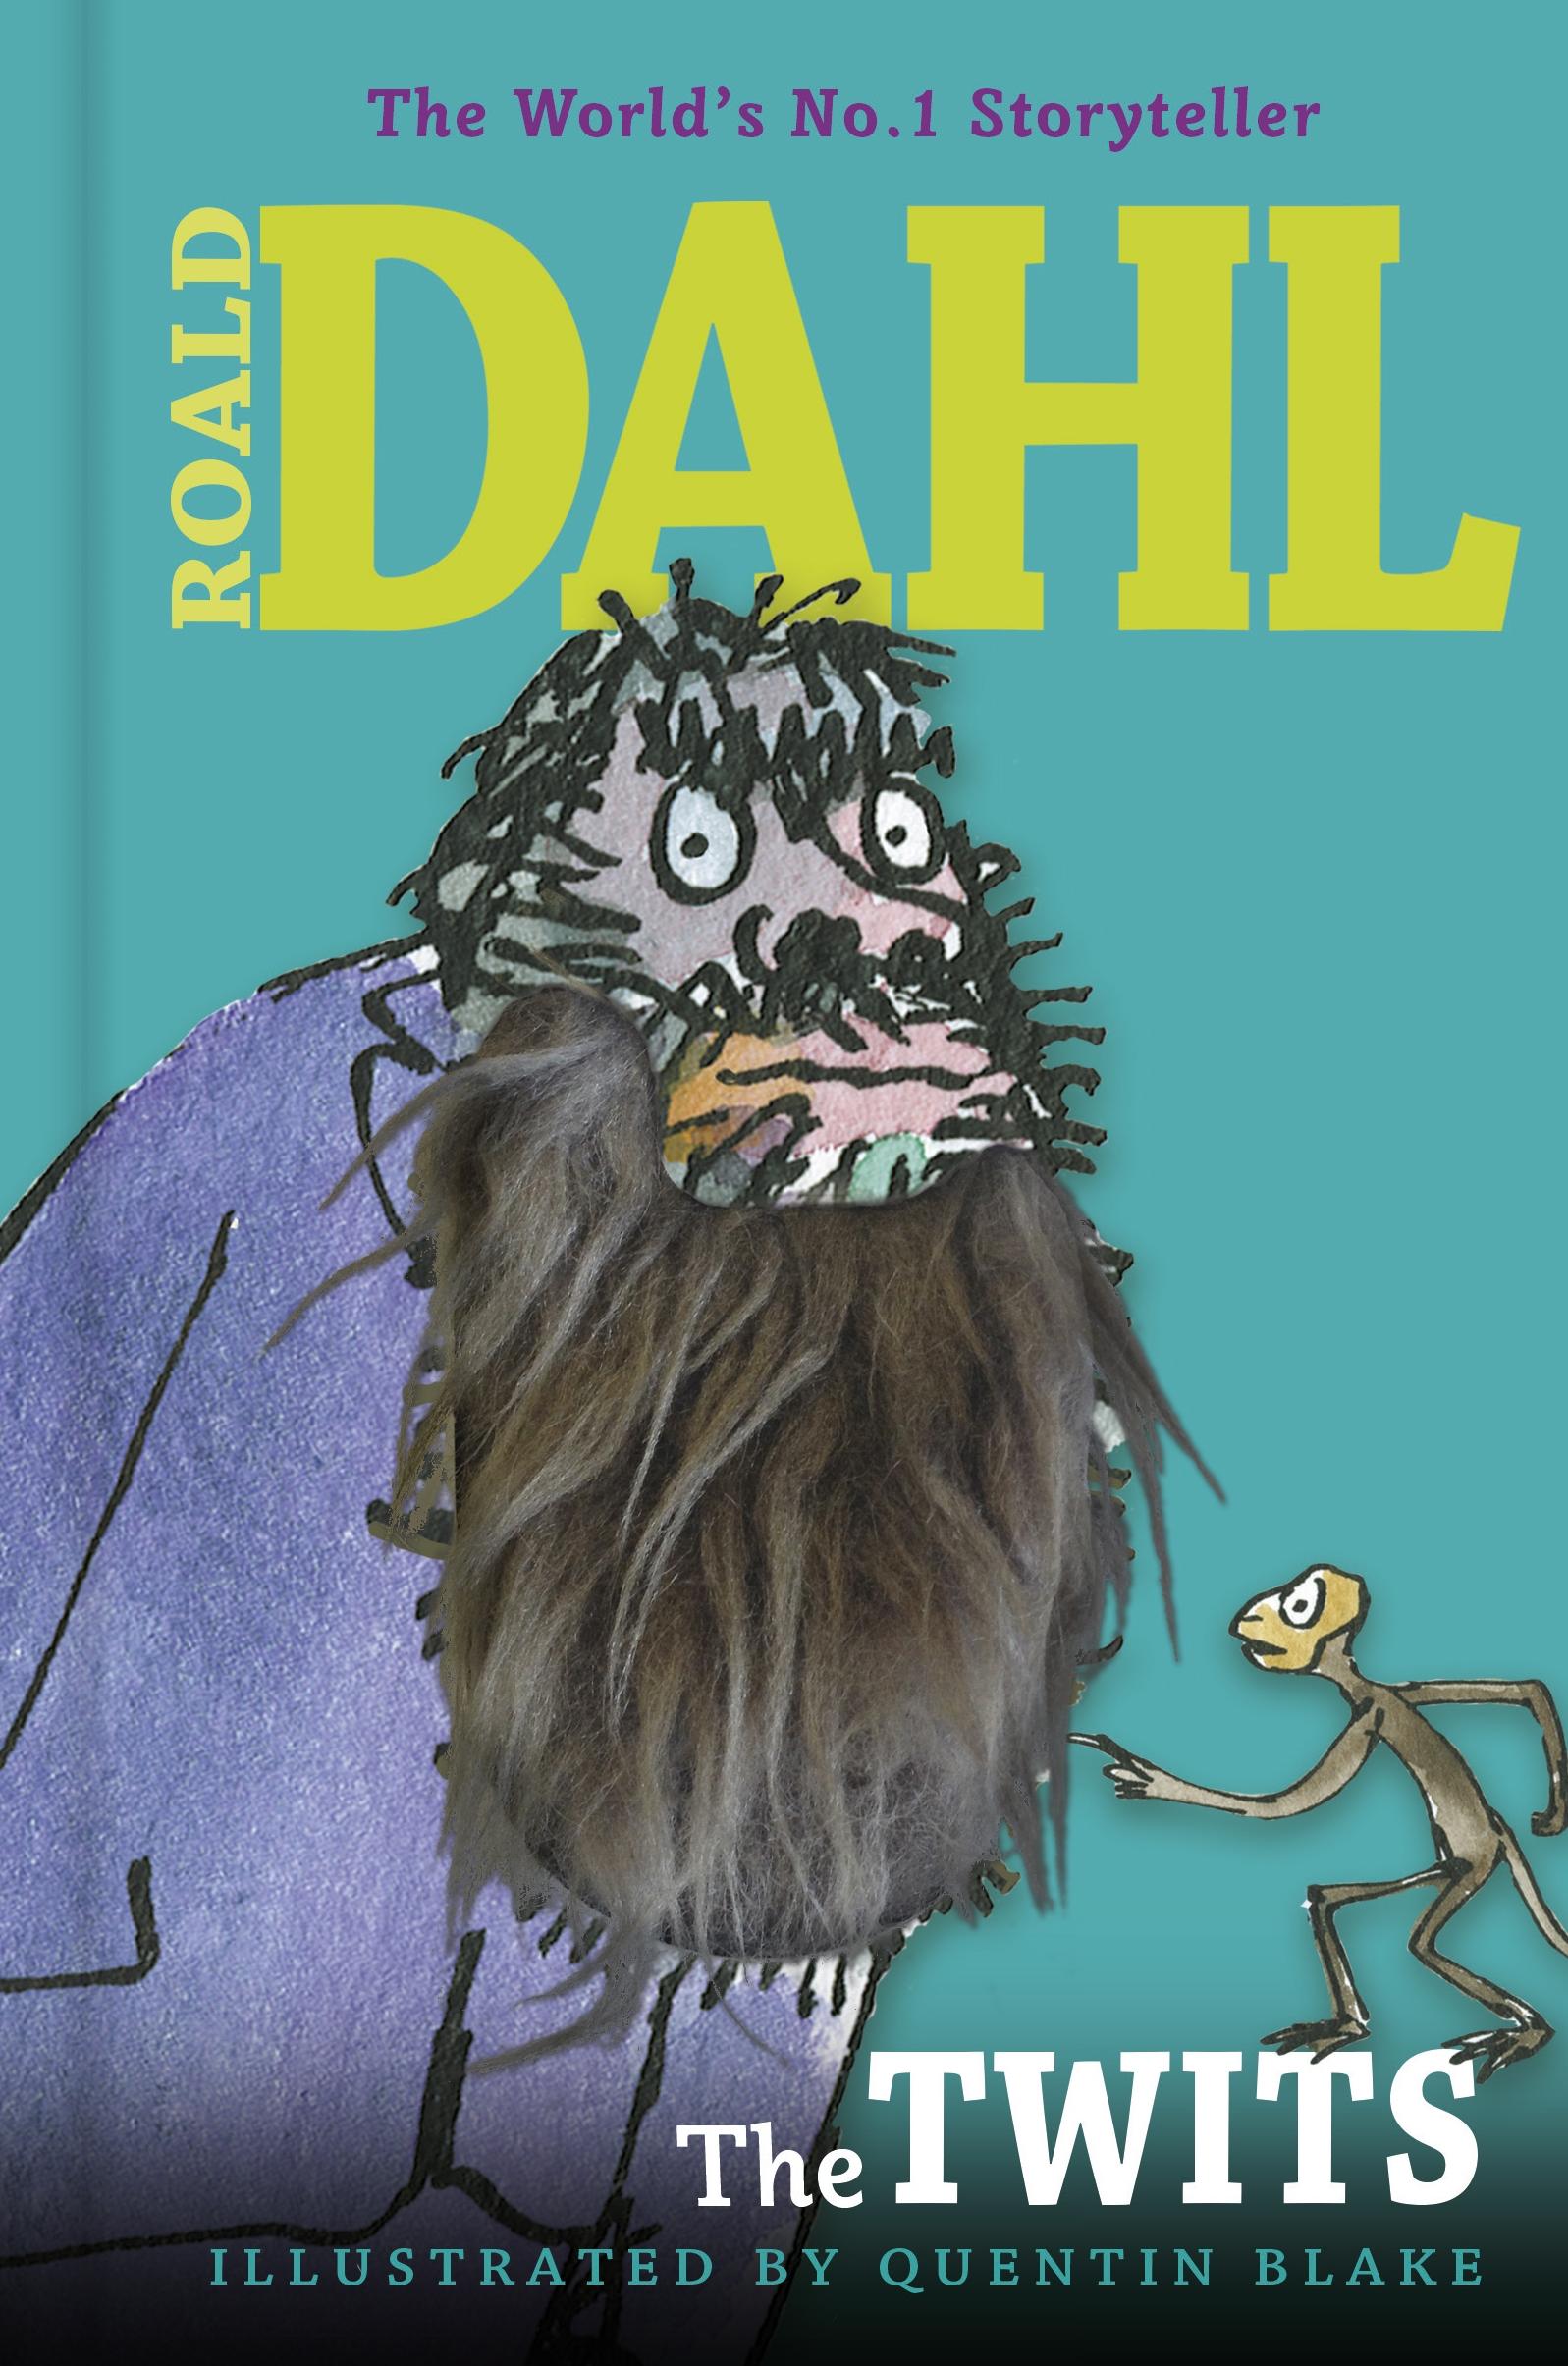 Roald Dahl Father Name Hairy Beard Edition